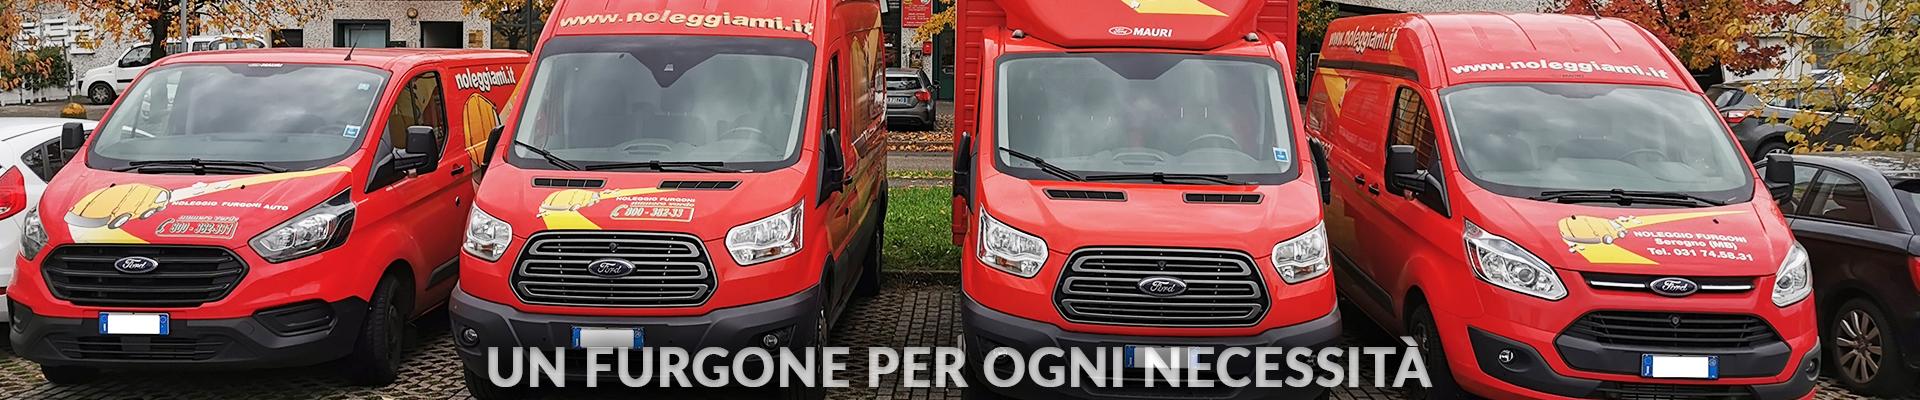 slide_un-furgone-per-ogni-necessita